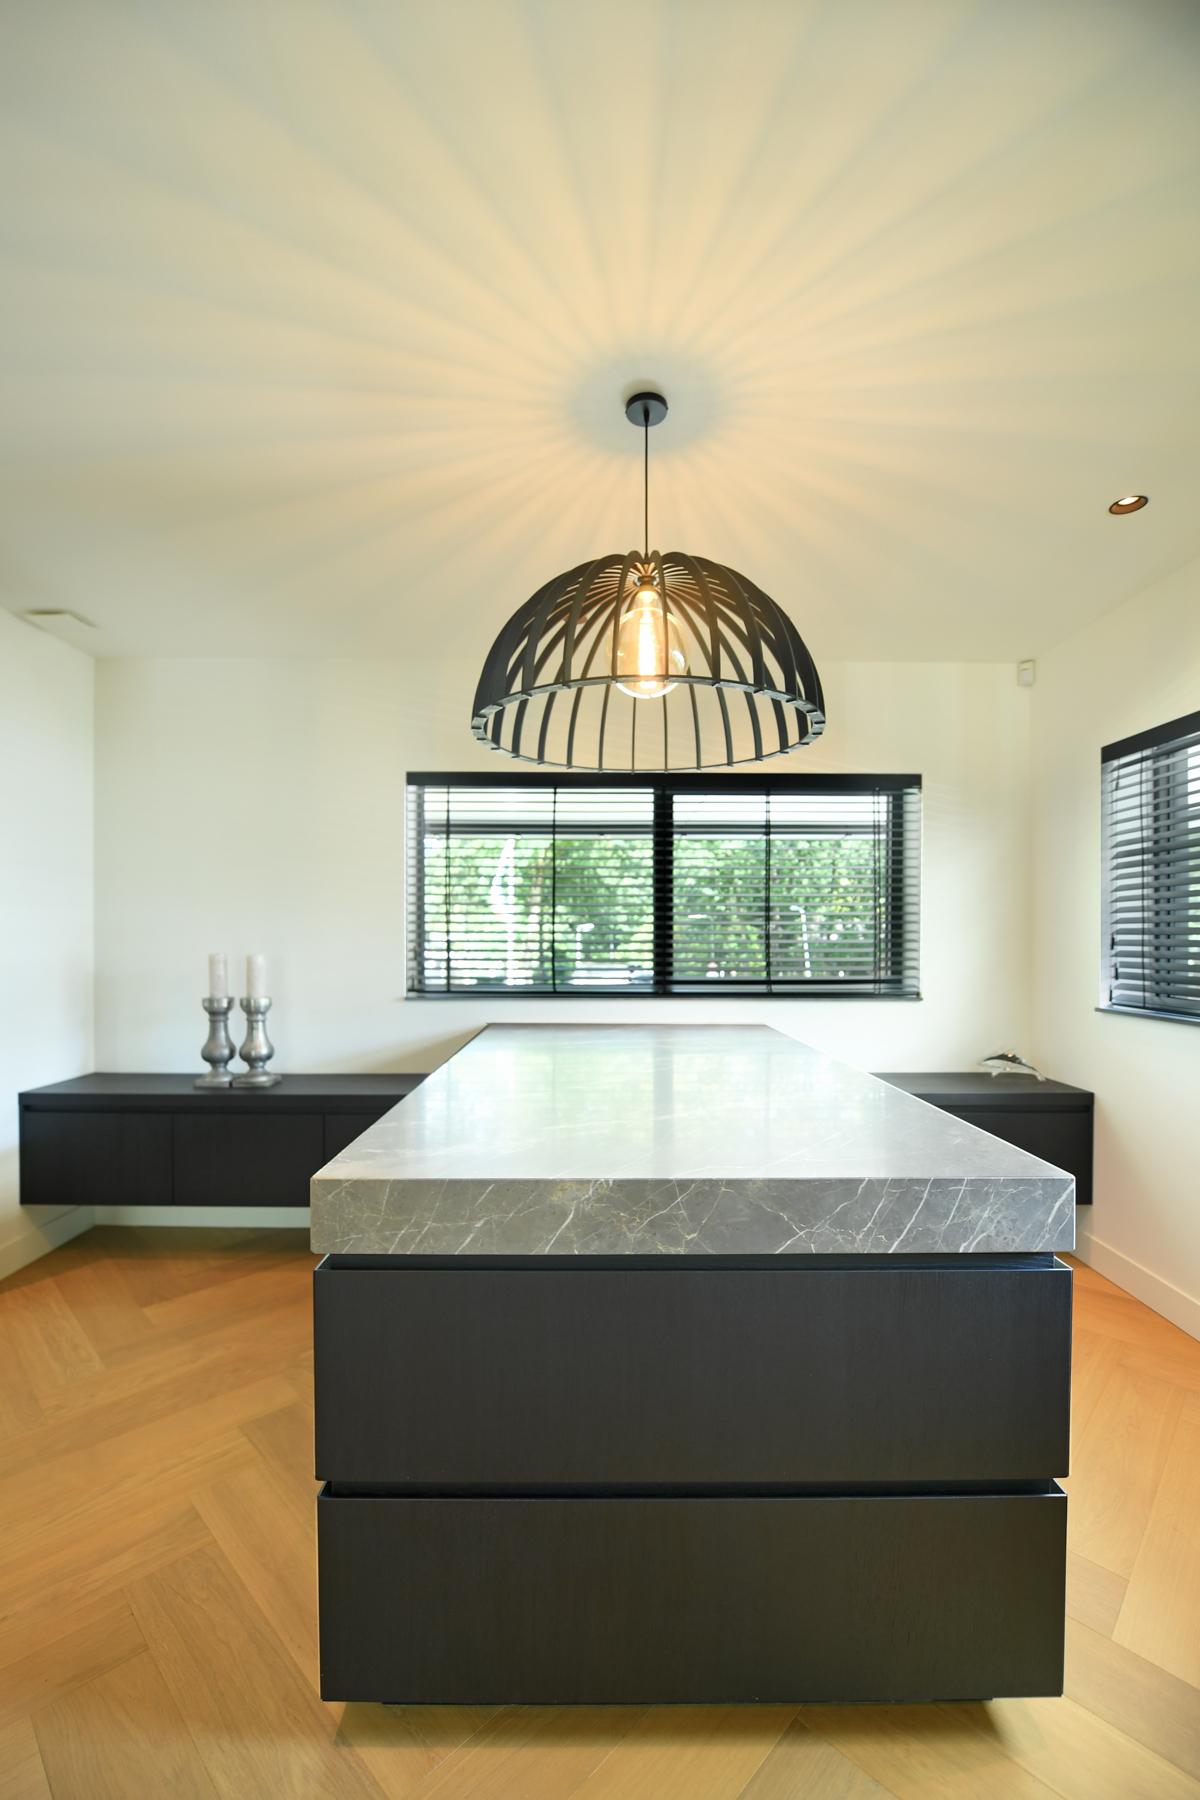 Modern herenhuis met aansprekende architectuur (79)